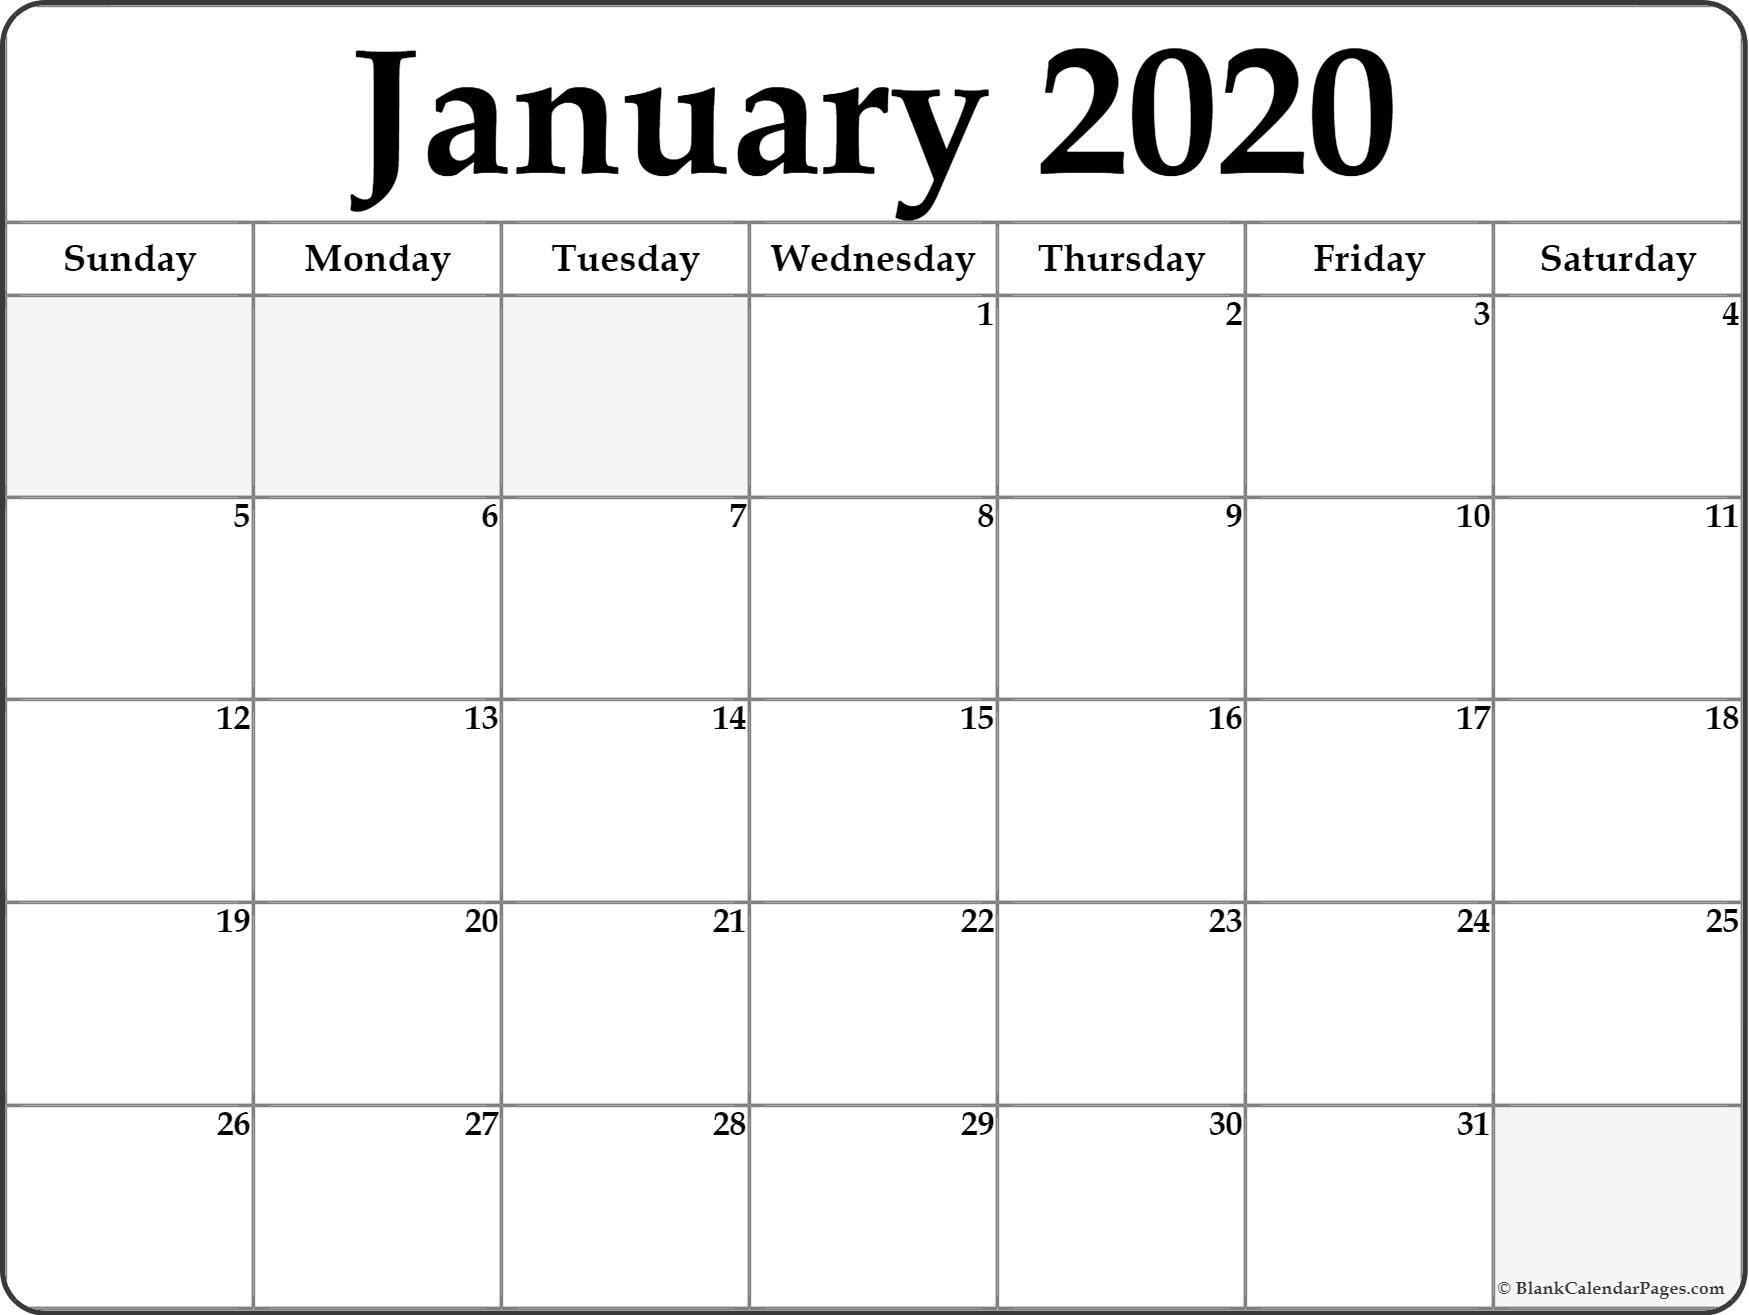 January 2020 Calendar   Free Printable Monthly Calendars with Imom Calendar 2020